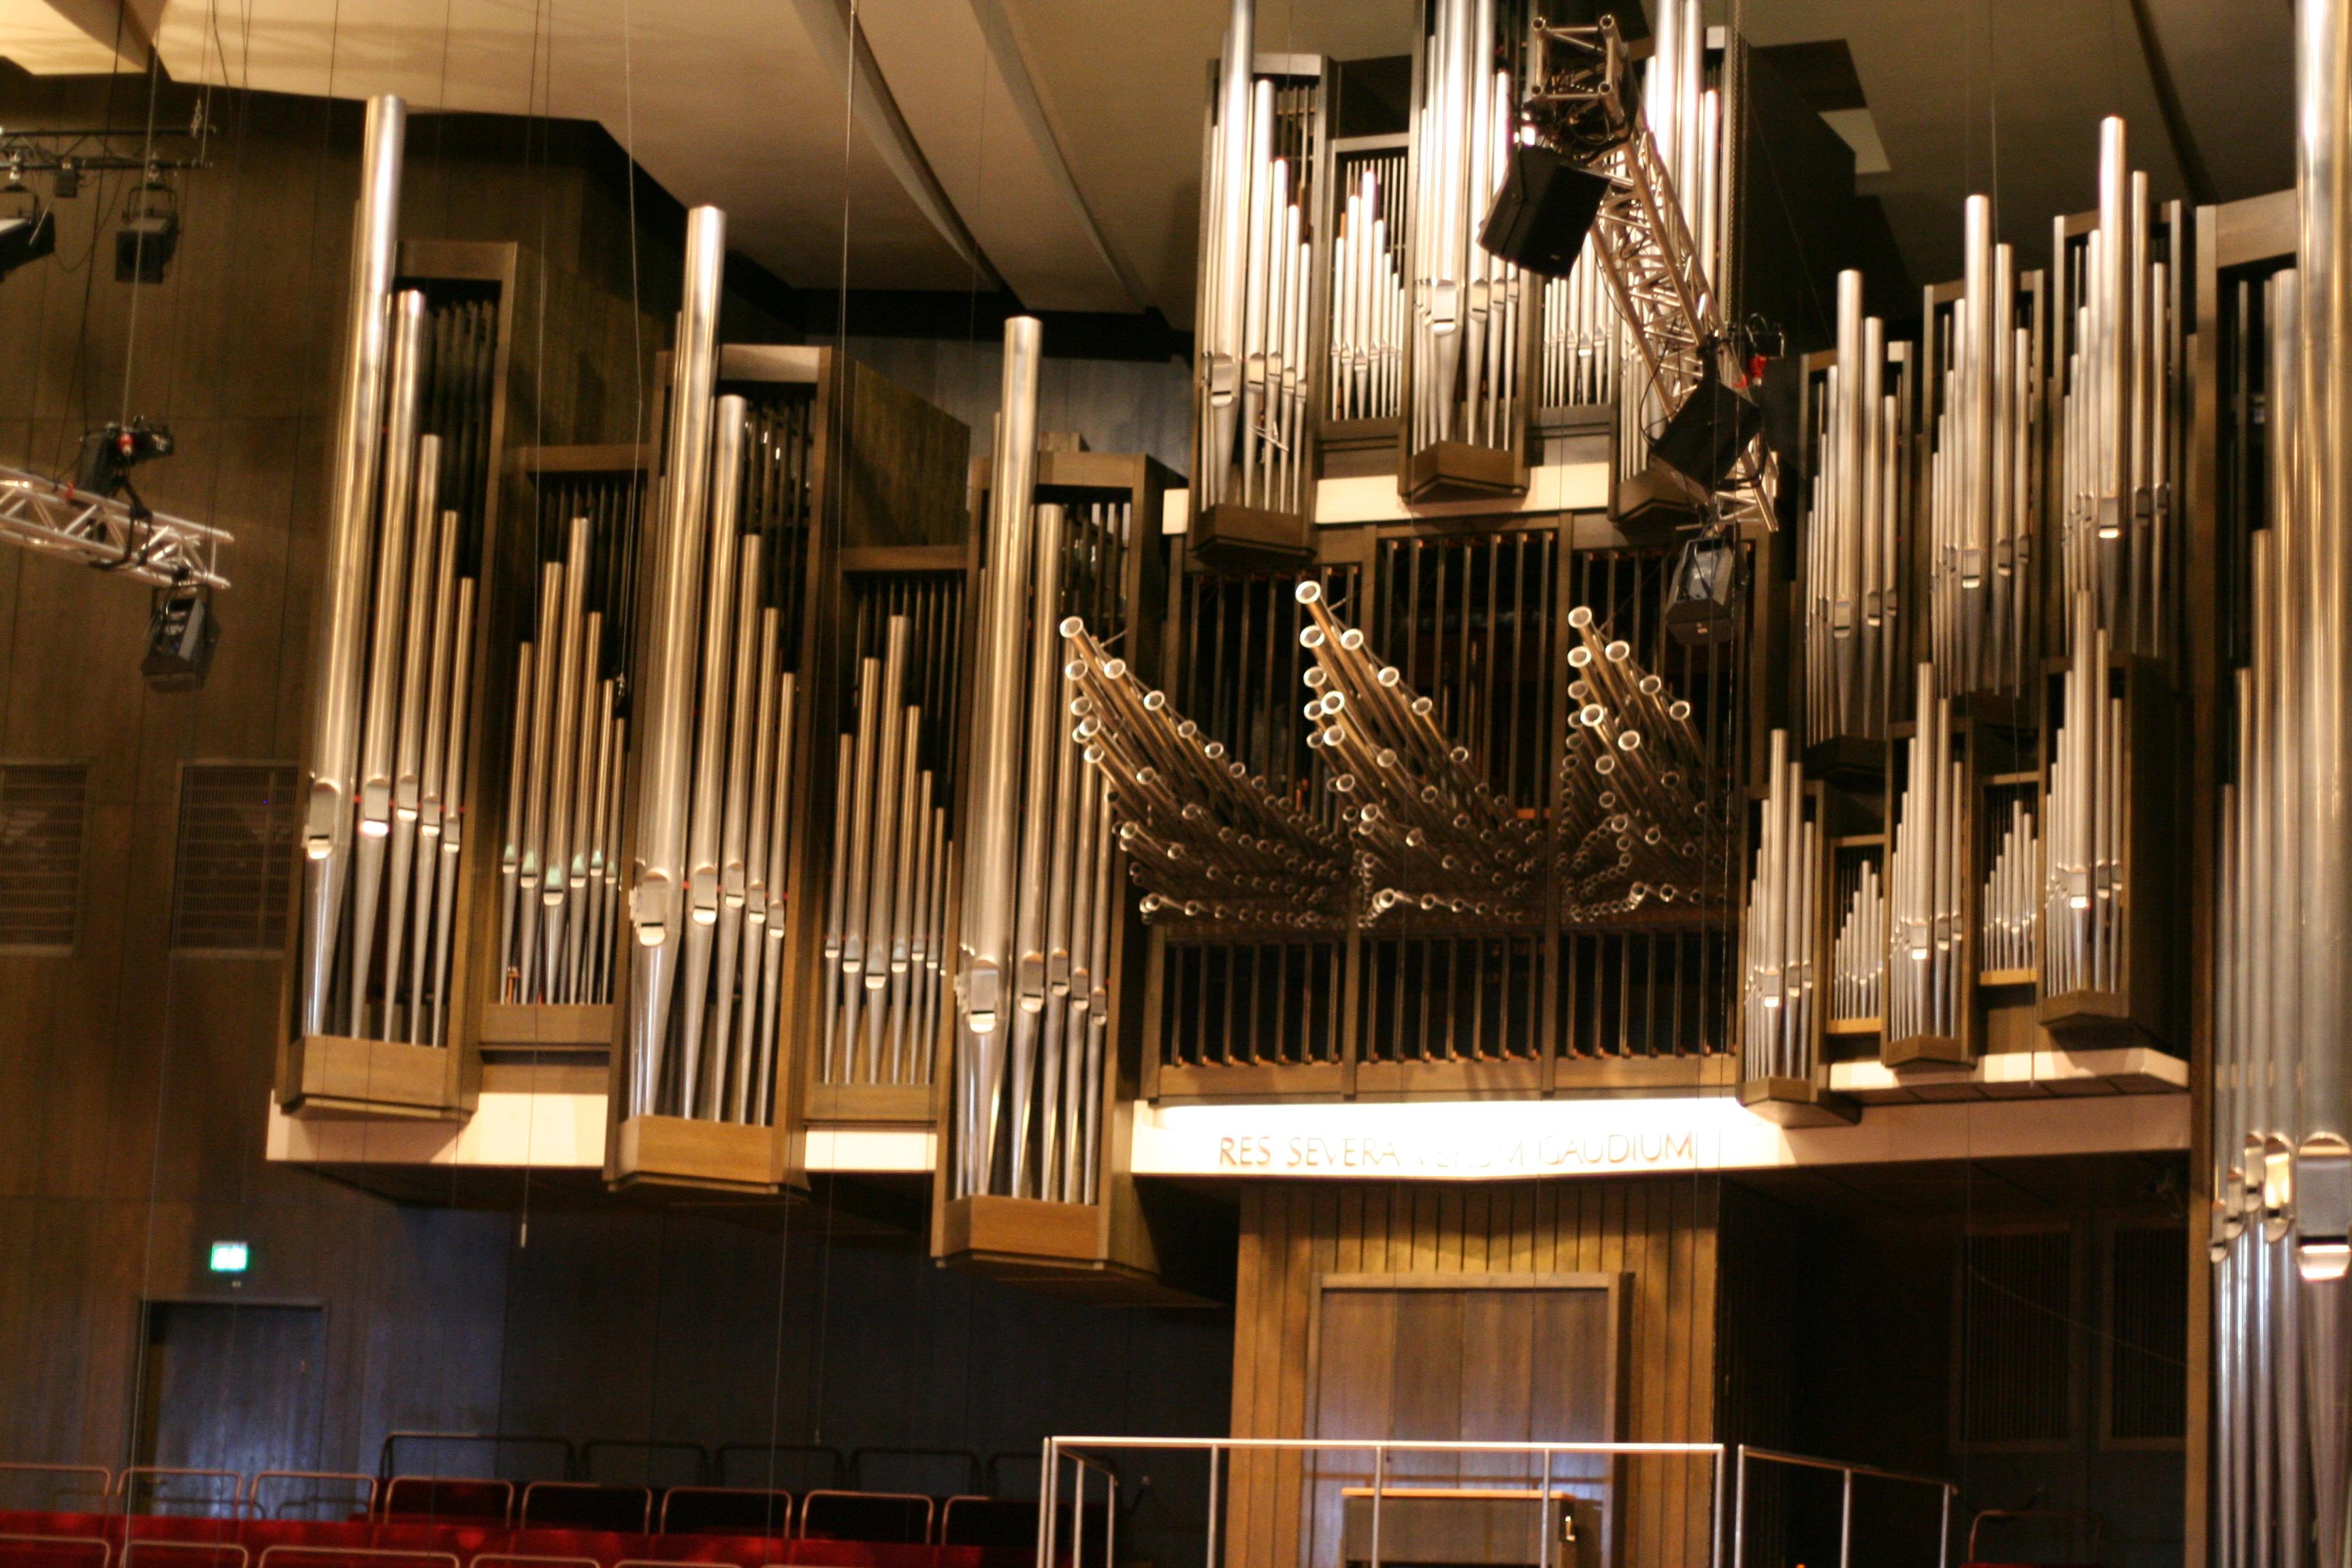 Johannes Brahms - Symphony 3 In F, Op 90 - Academic Festival Overture, Op 80